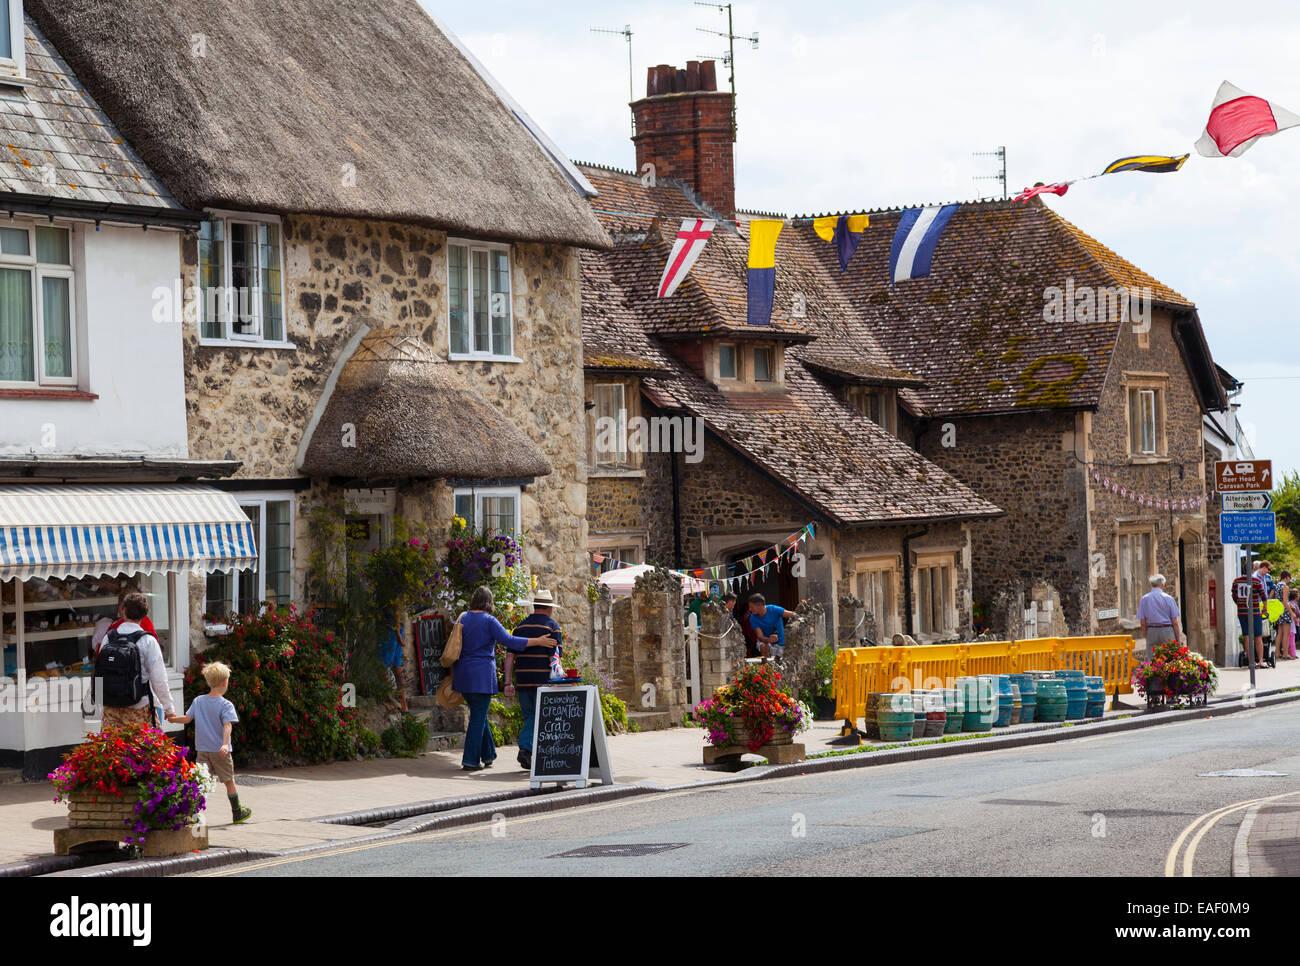 Fore street, Beer, Devon - Stock Image